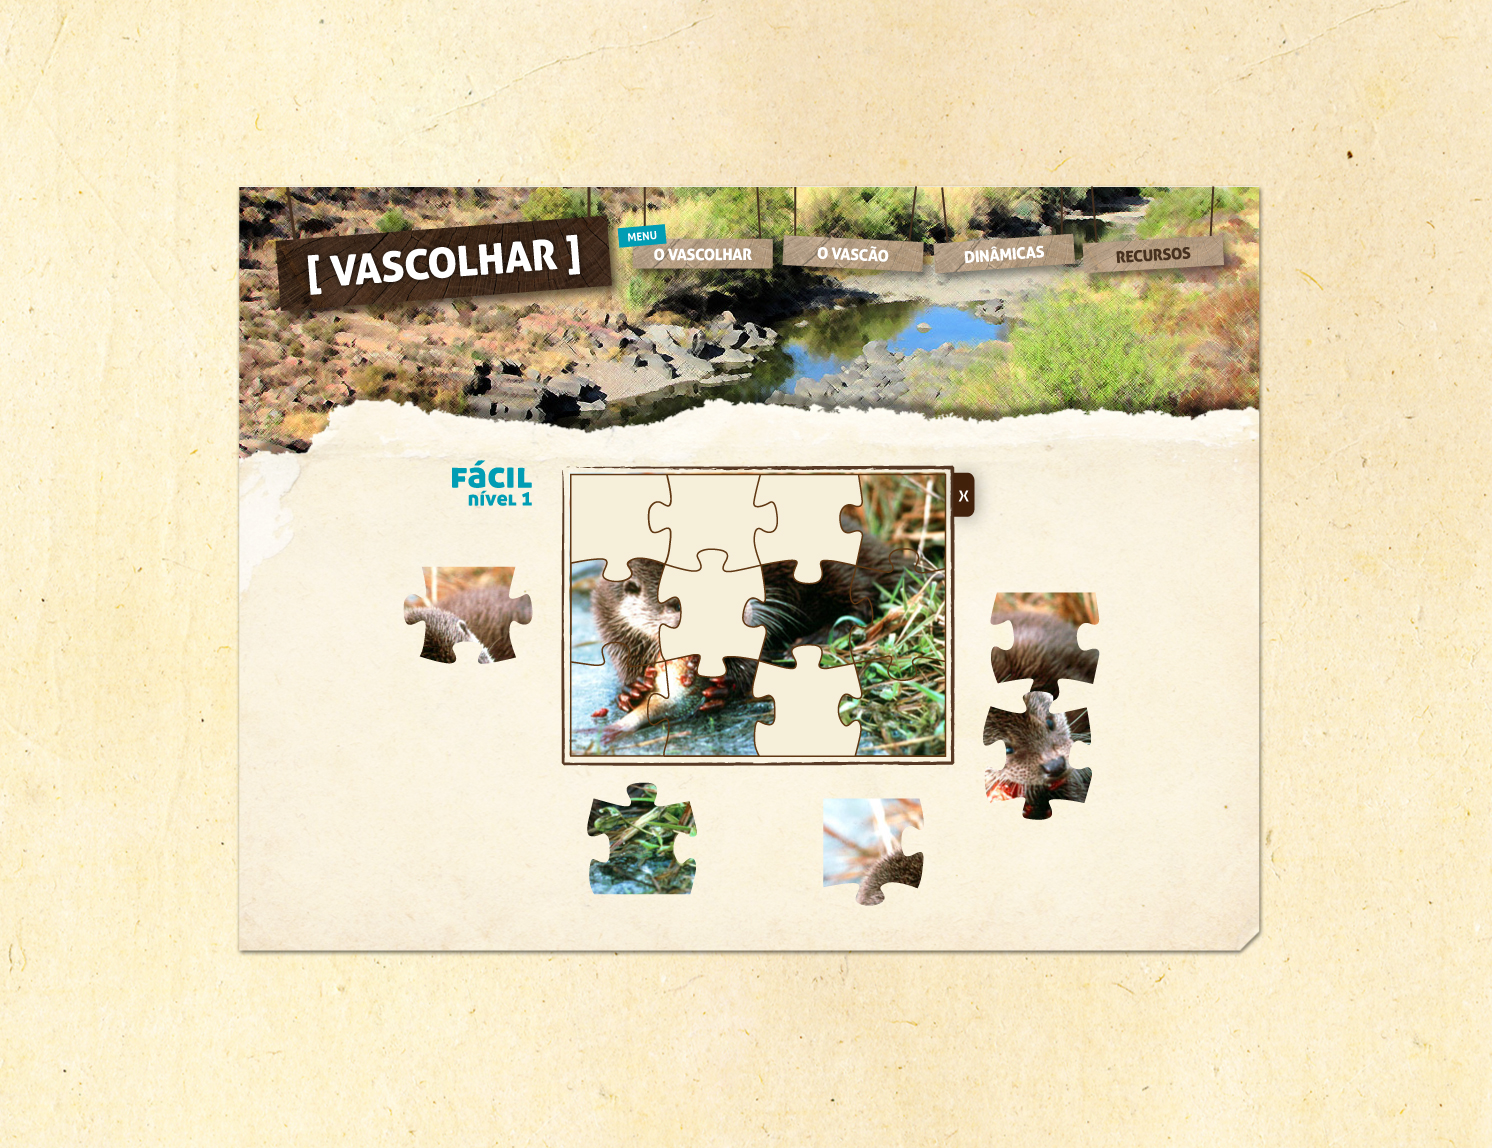 jogos_puzzle02.jpg